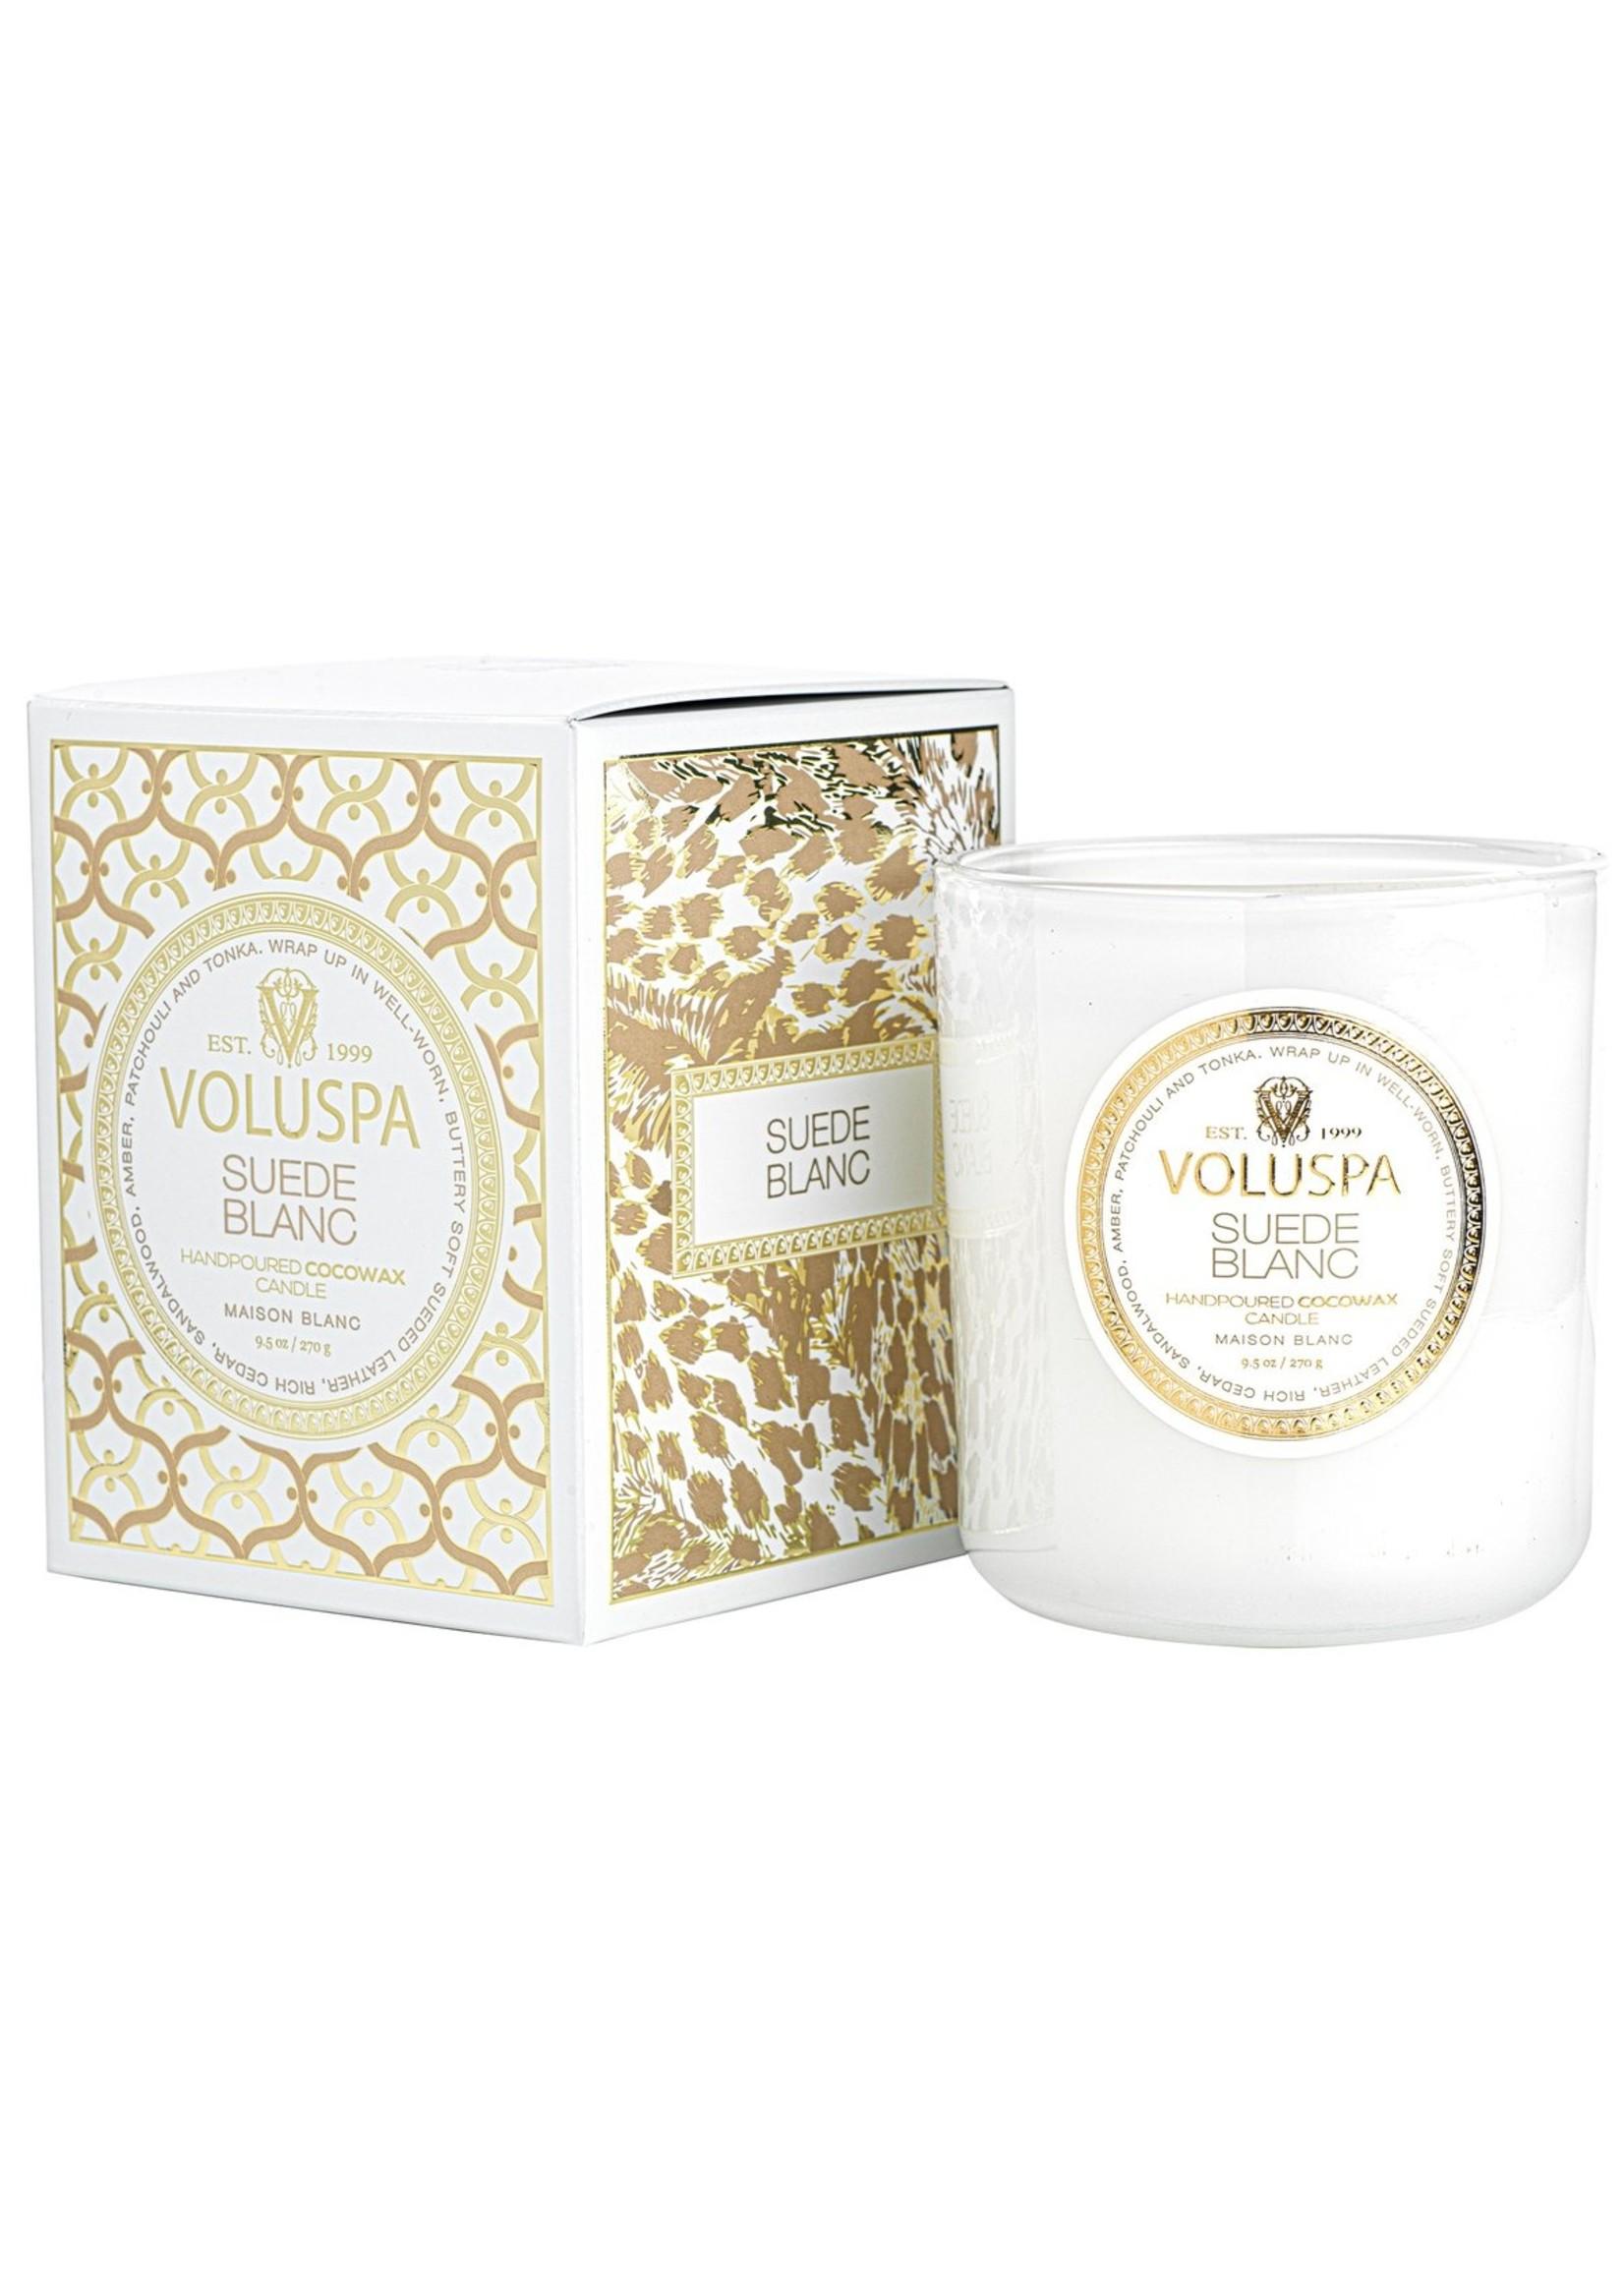 Voluspa Suede Blanc Classic Candle